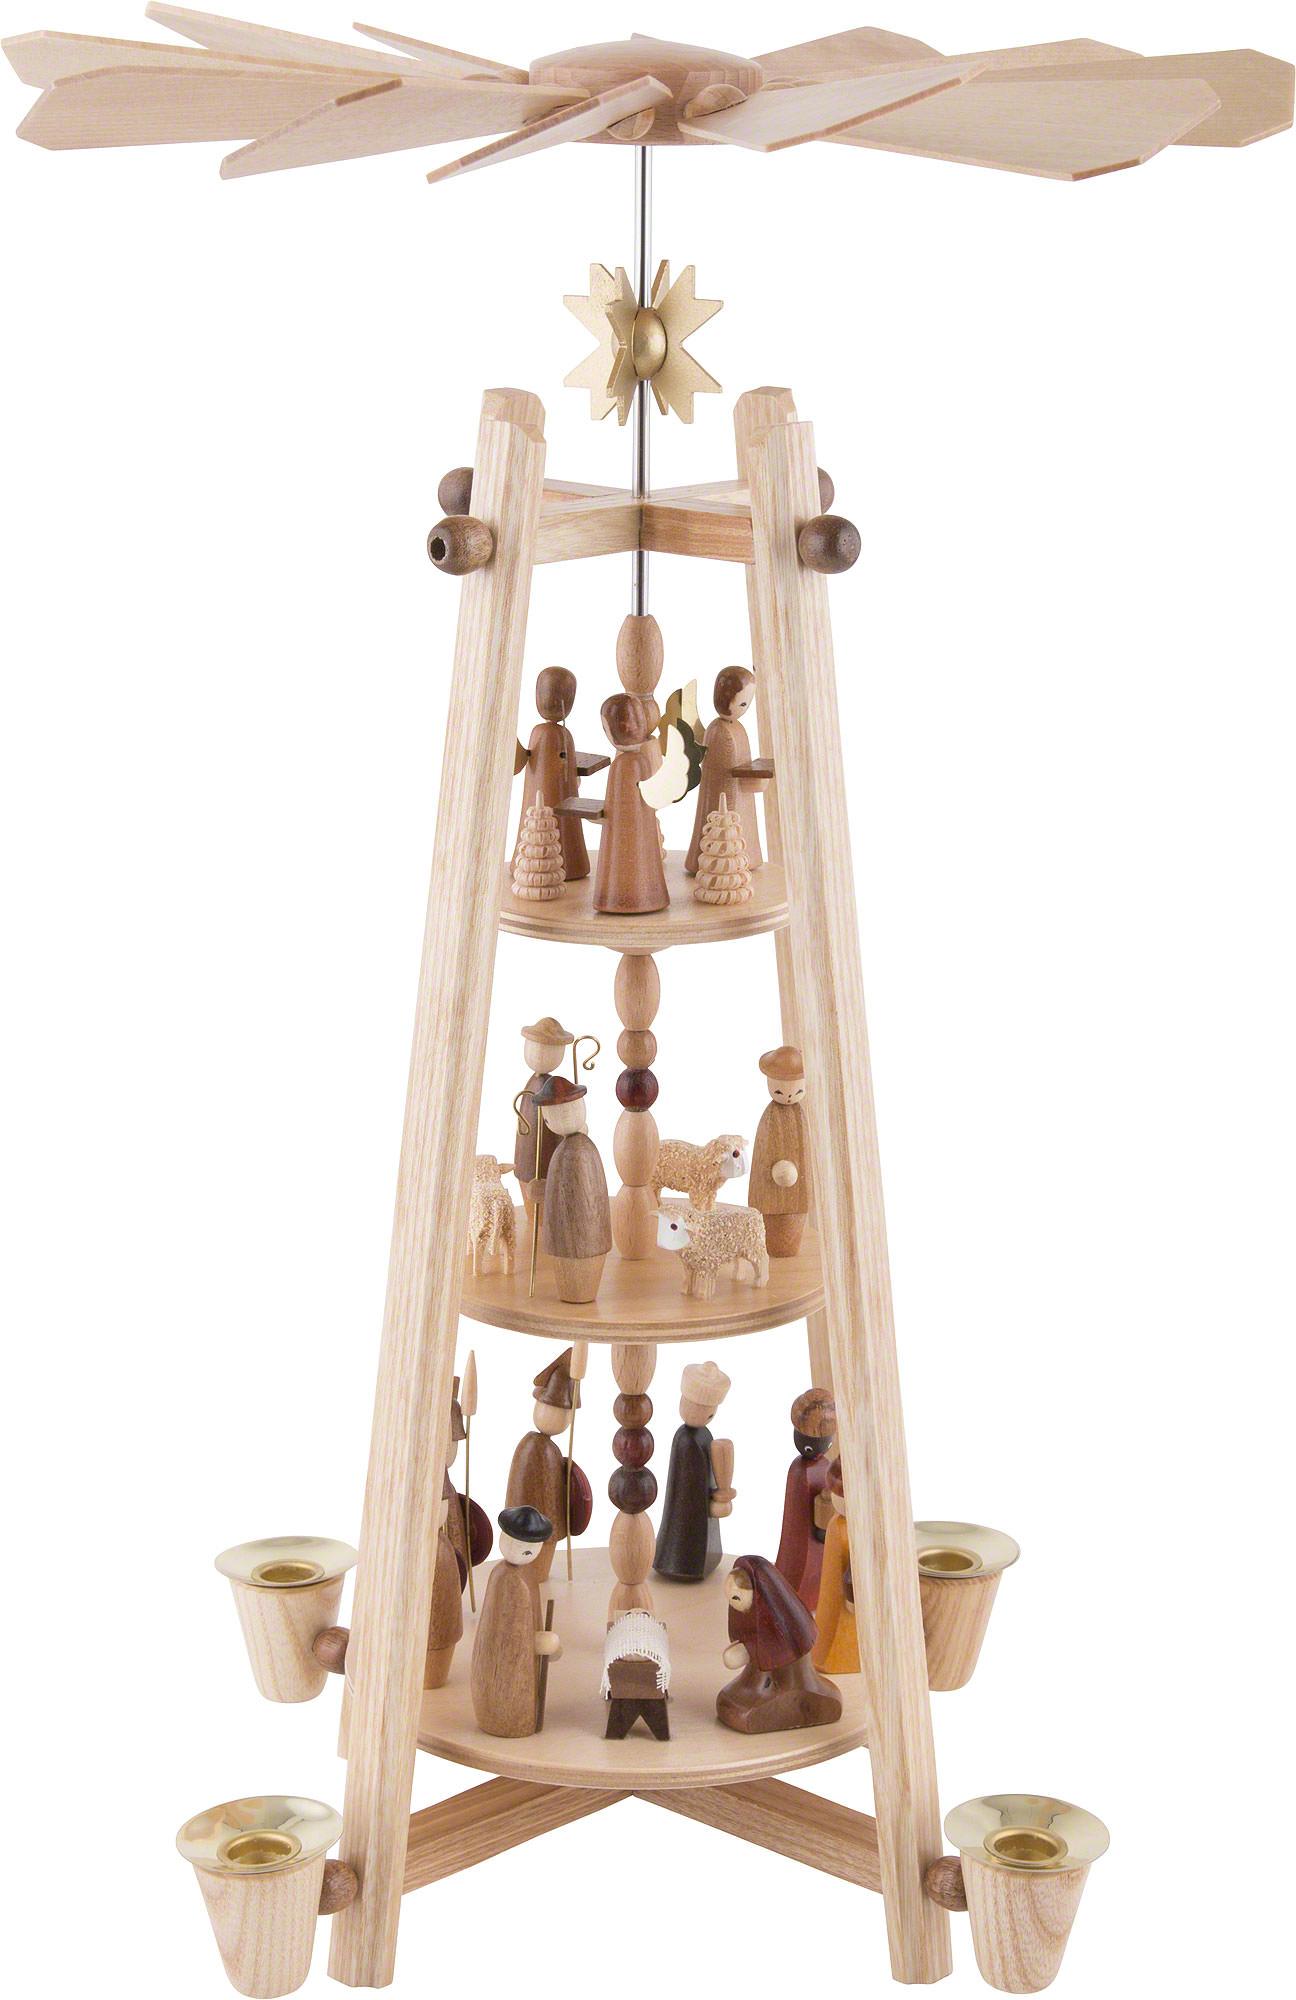 3 tier pyramid nativity scene 44 cm 16in by dregeno. Black Bedroom Furniture Sets. Home Design Ideas